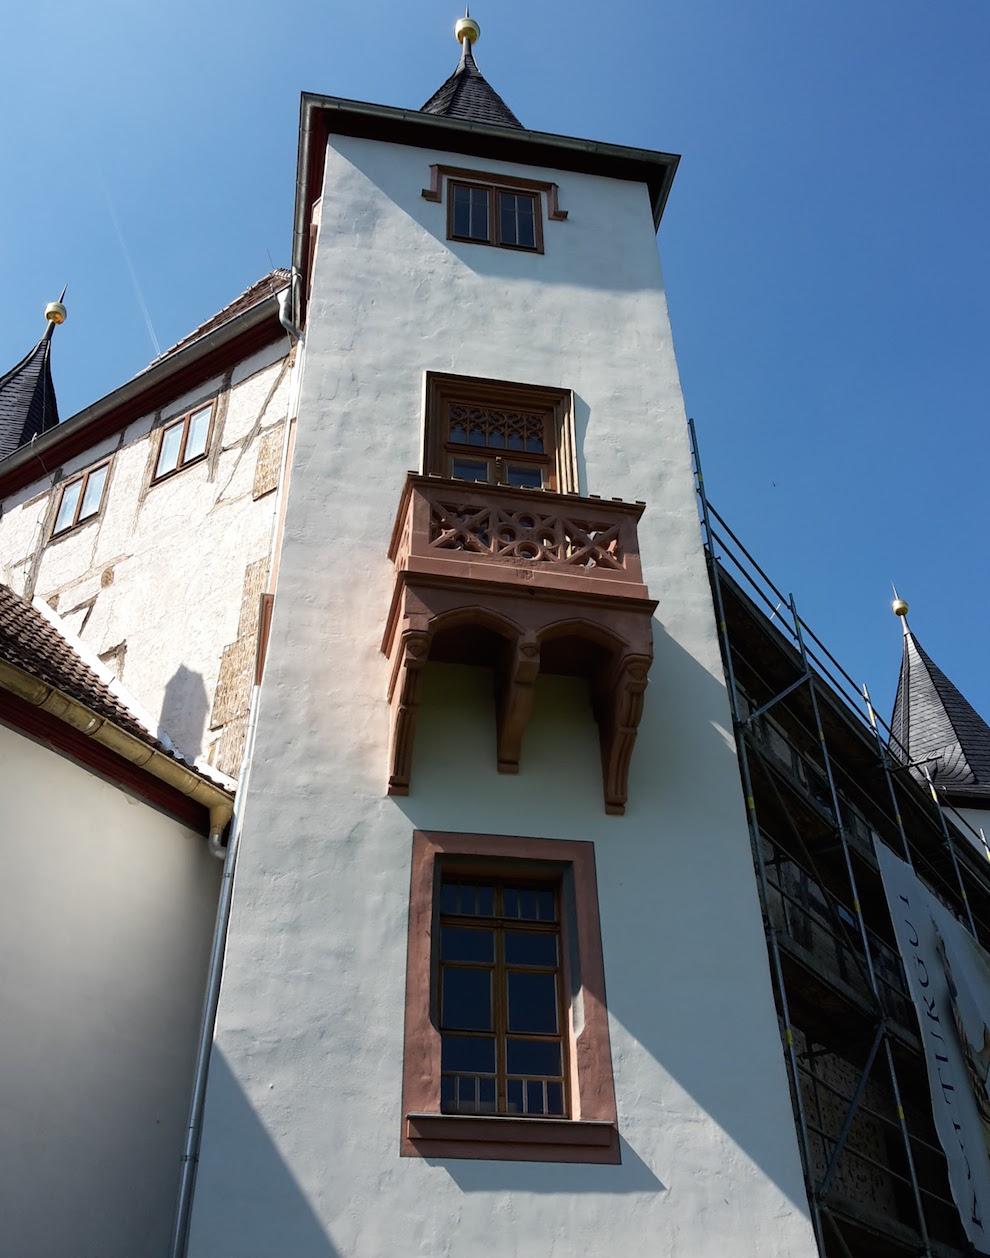 2017.08.29_Spaziergang 12 Trockenborn_Schloss Wolfersdorf